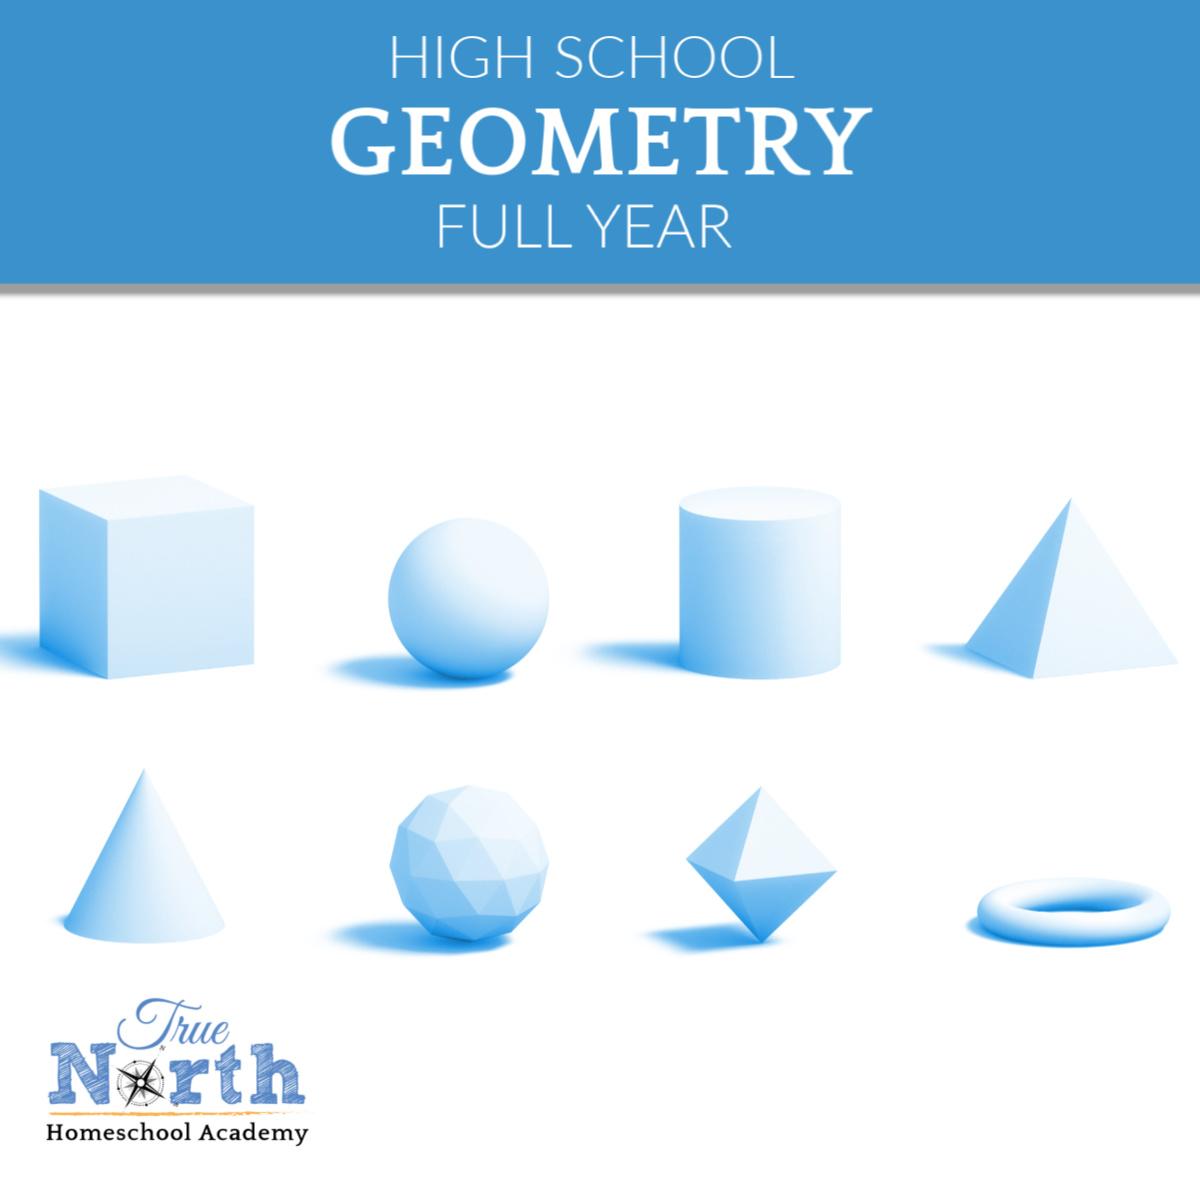 Geometry True North Homeschool Academy